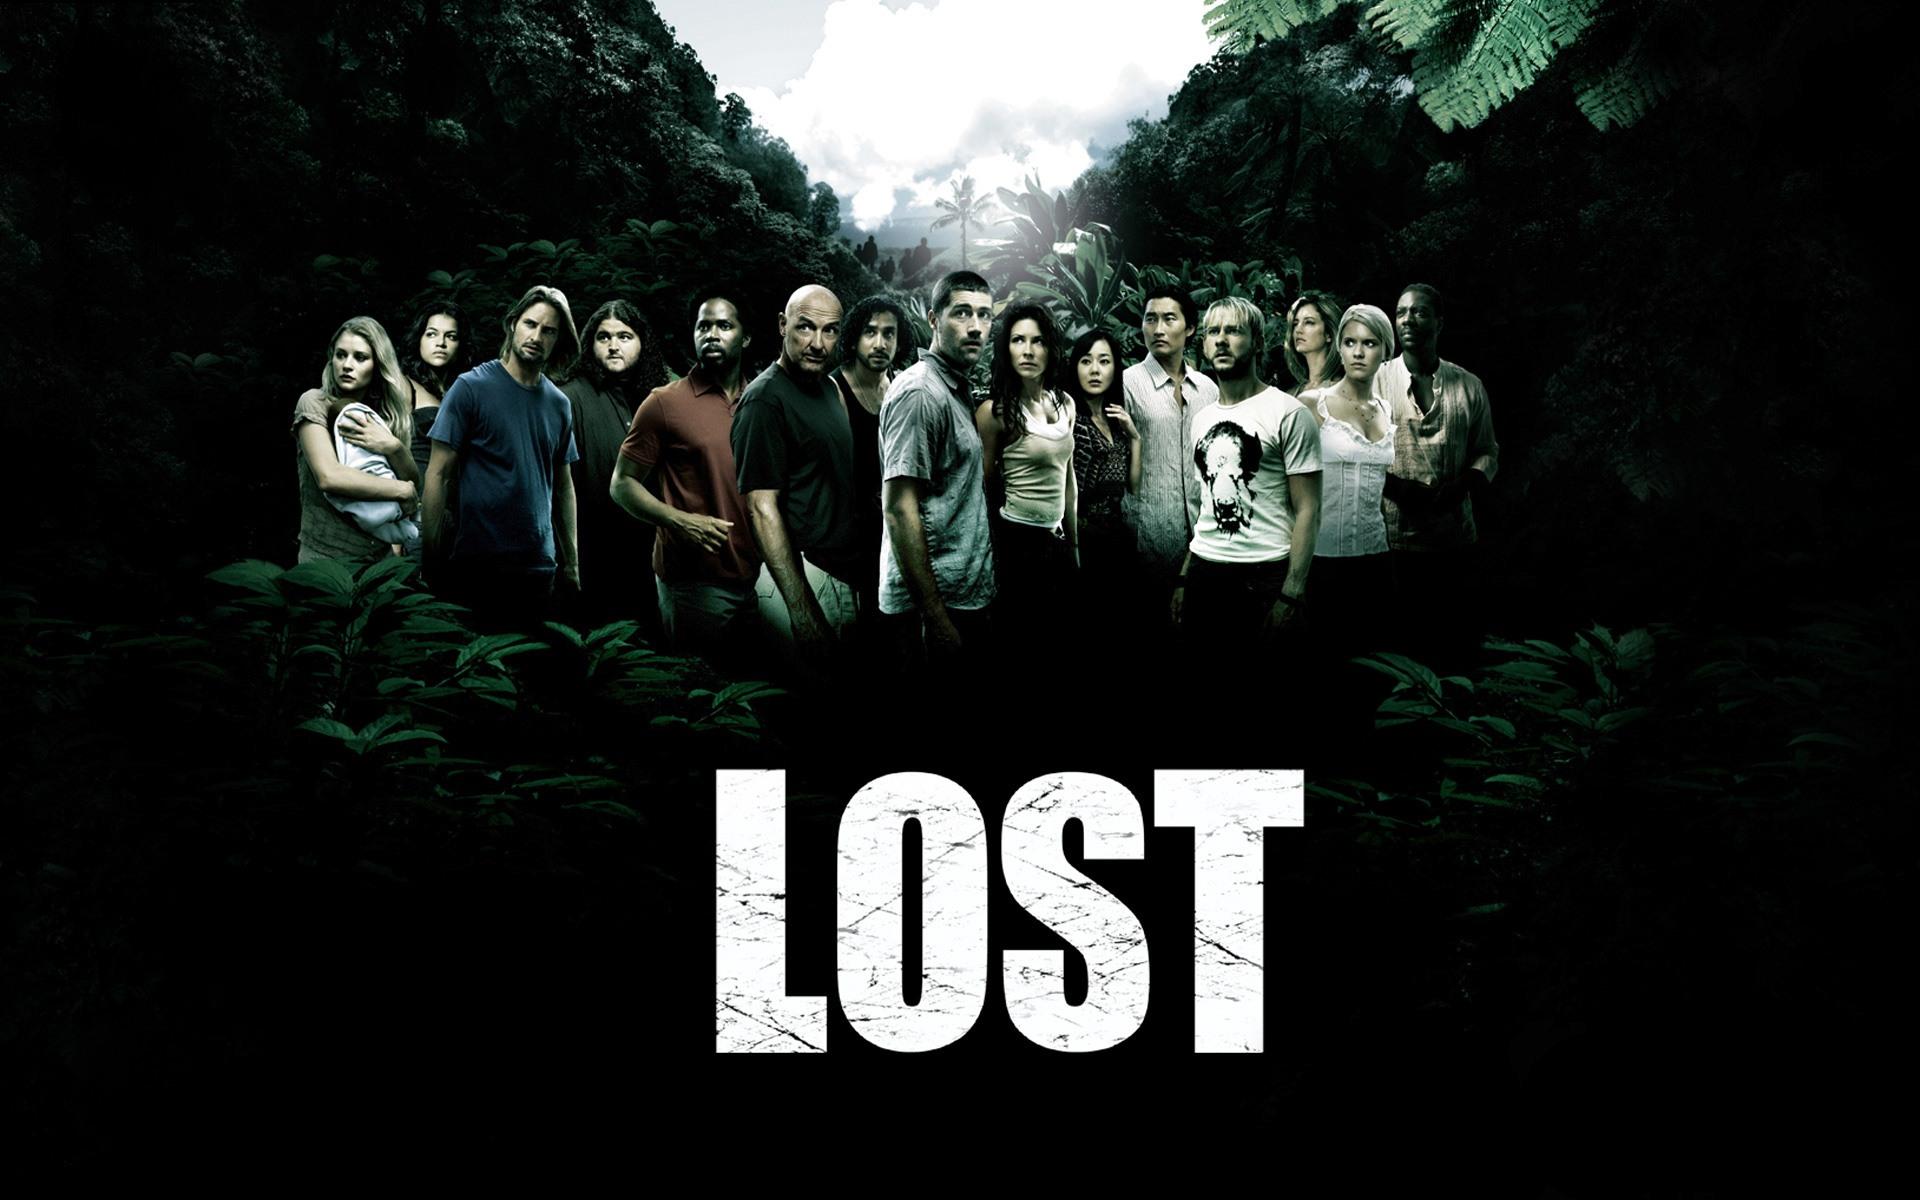 Lost TV Series 4K Wallpaper The Big Photos 1920x1200